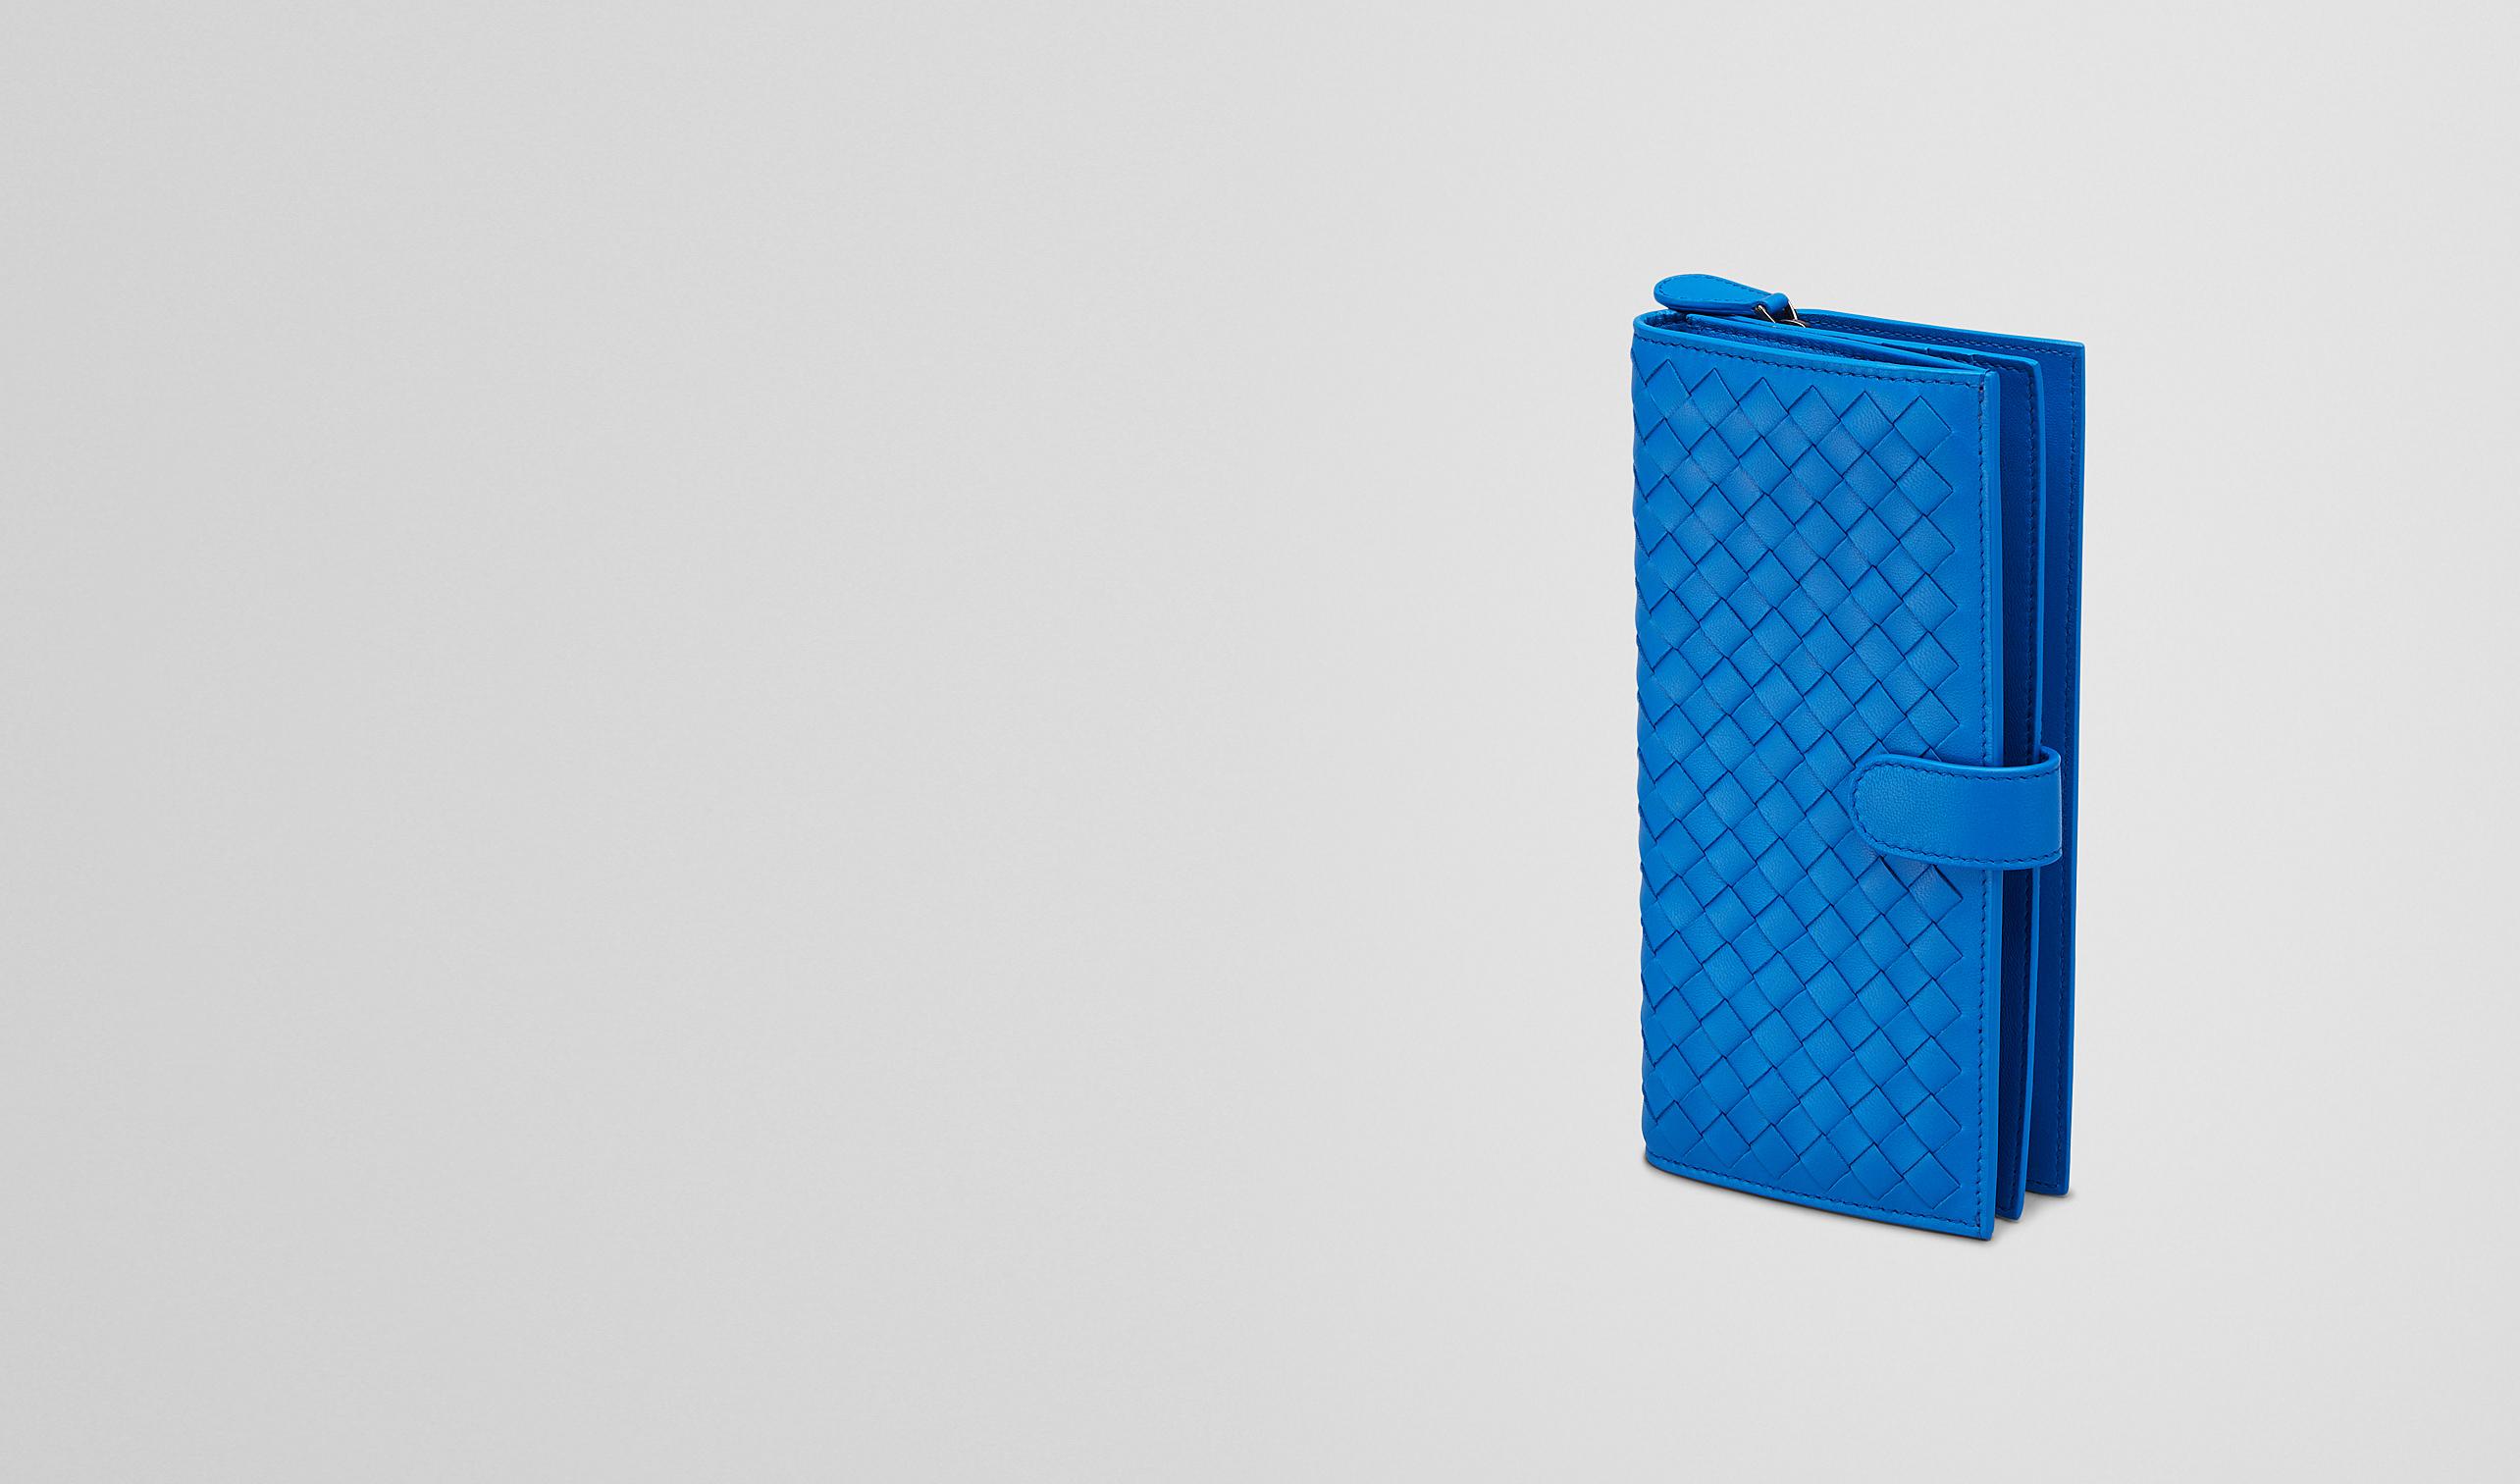 BOTTEGA VENETA Continental Portemonnaie D CONTINENTAL PORTEMONNAIE AUS NAPPALEDER INTRECCIATO SIGNAL BLUE pl